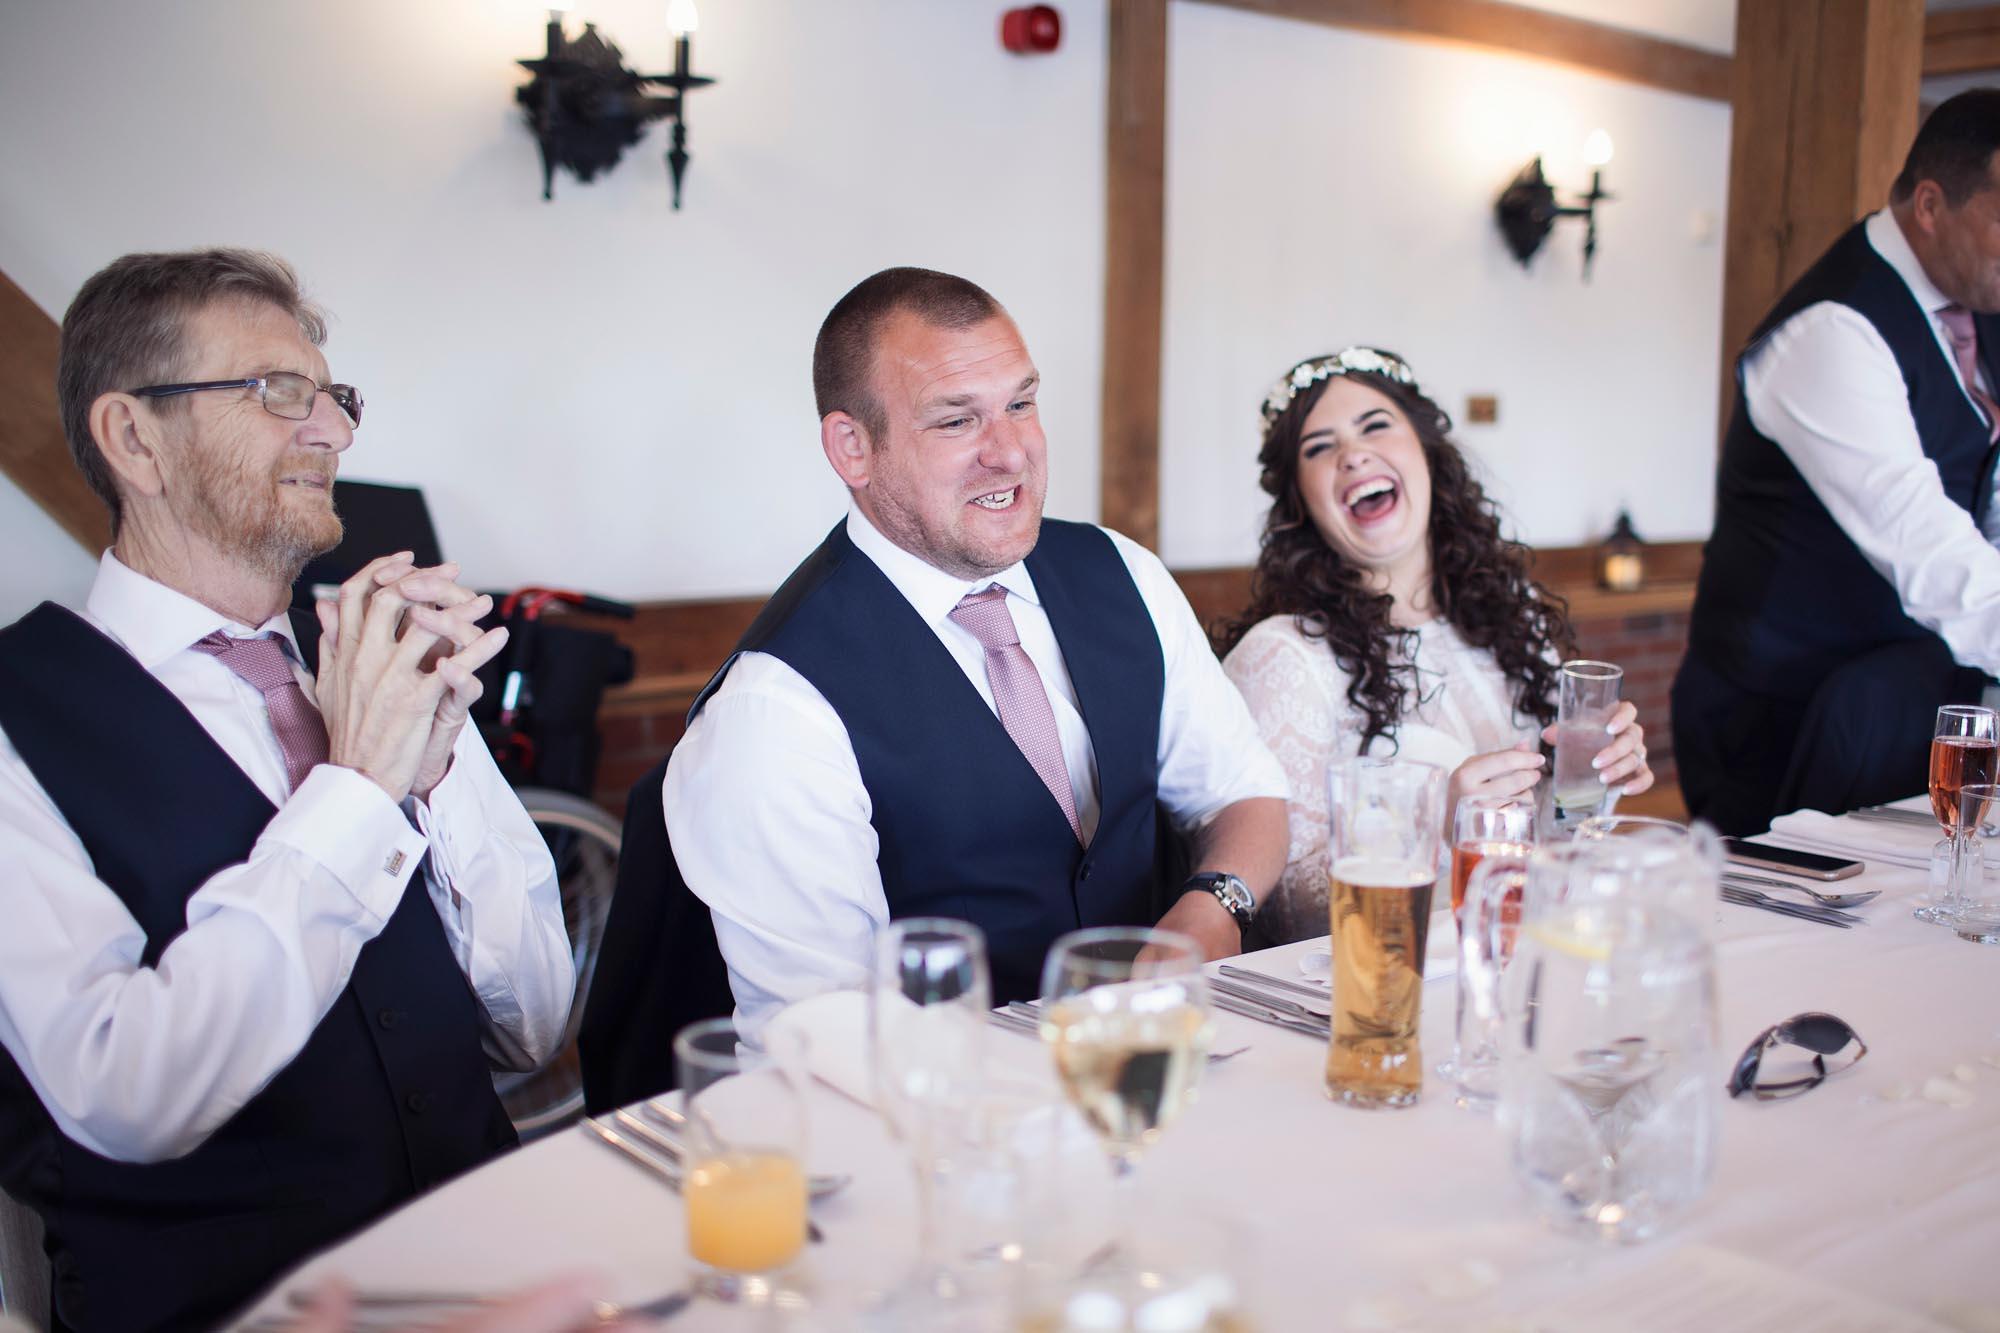 Bride and groom documentary photography cheshire wedding